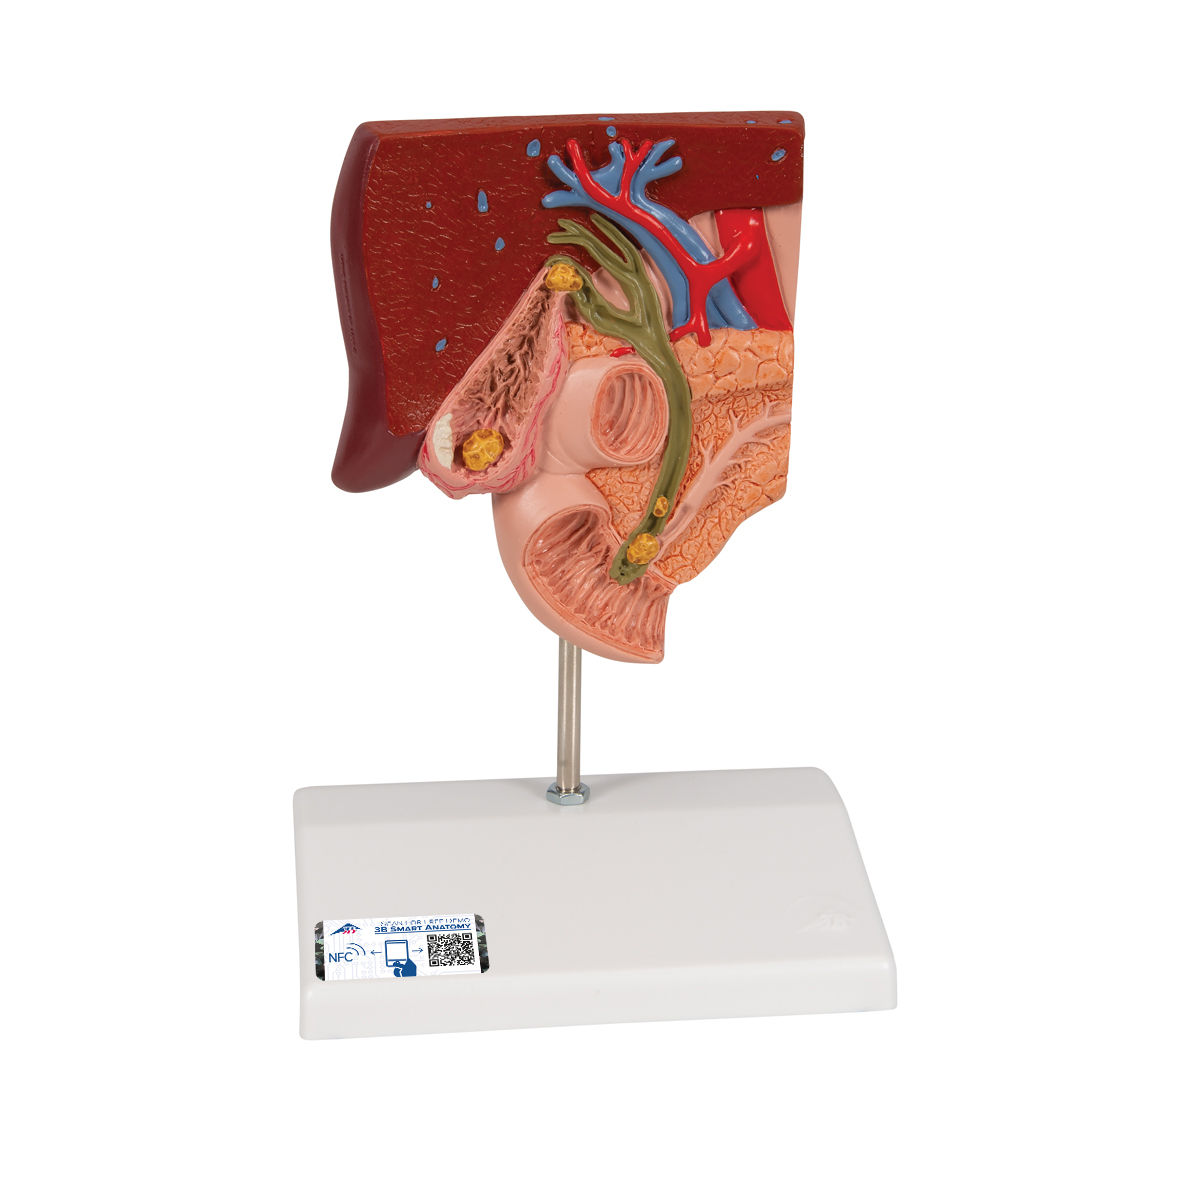 Anatomical Teaching Models Plastic Human Digestive Models